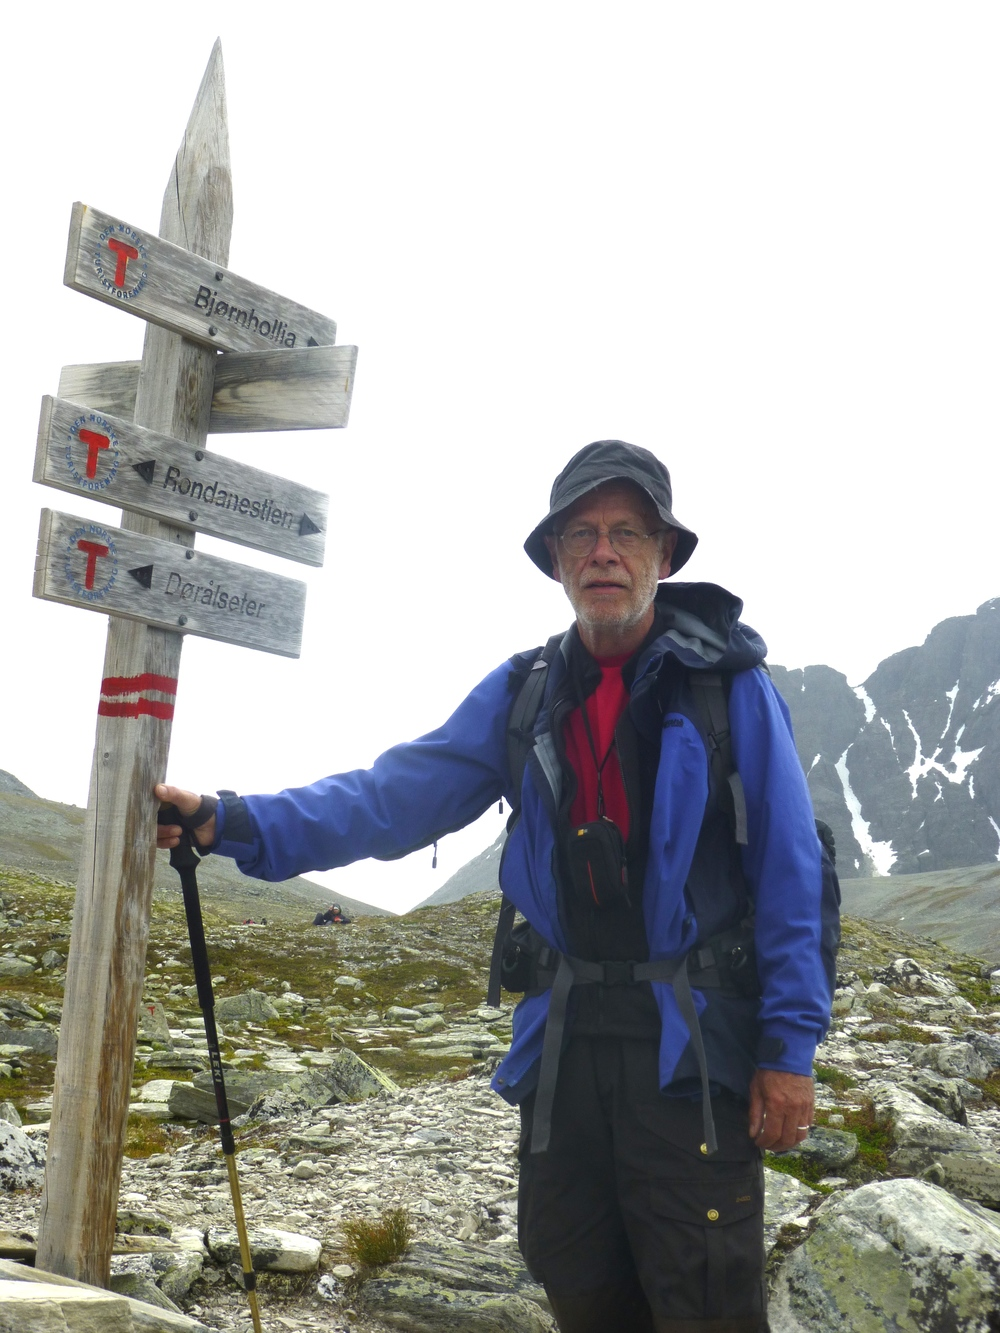 I Dovre fjeldet, Norge, juli 2013